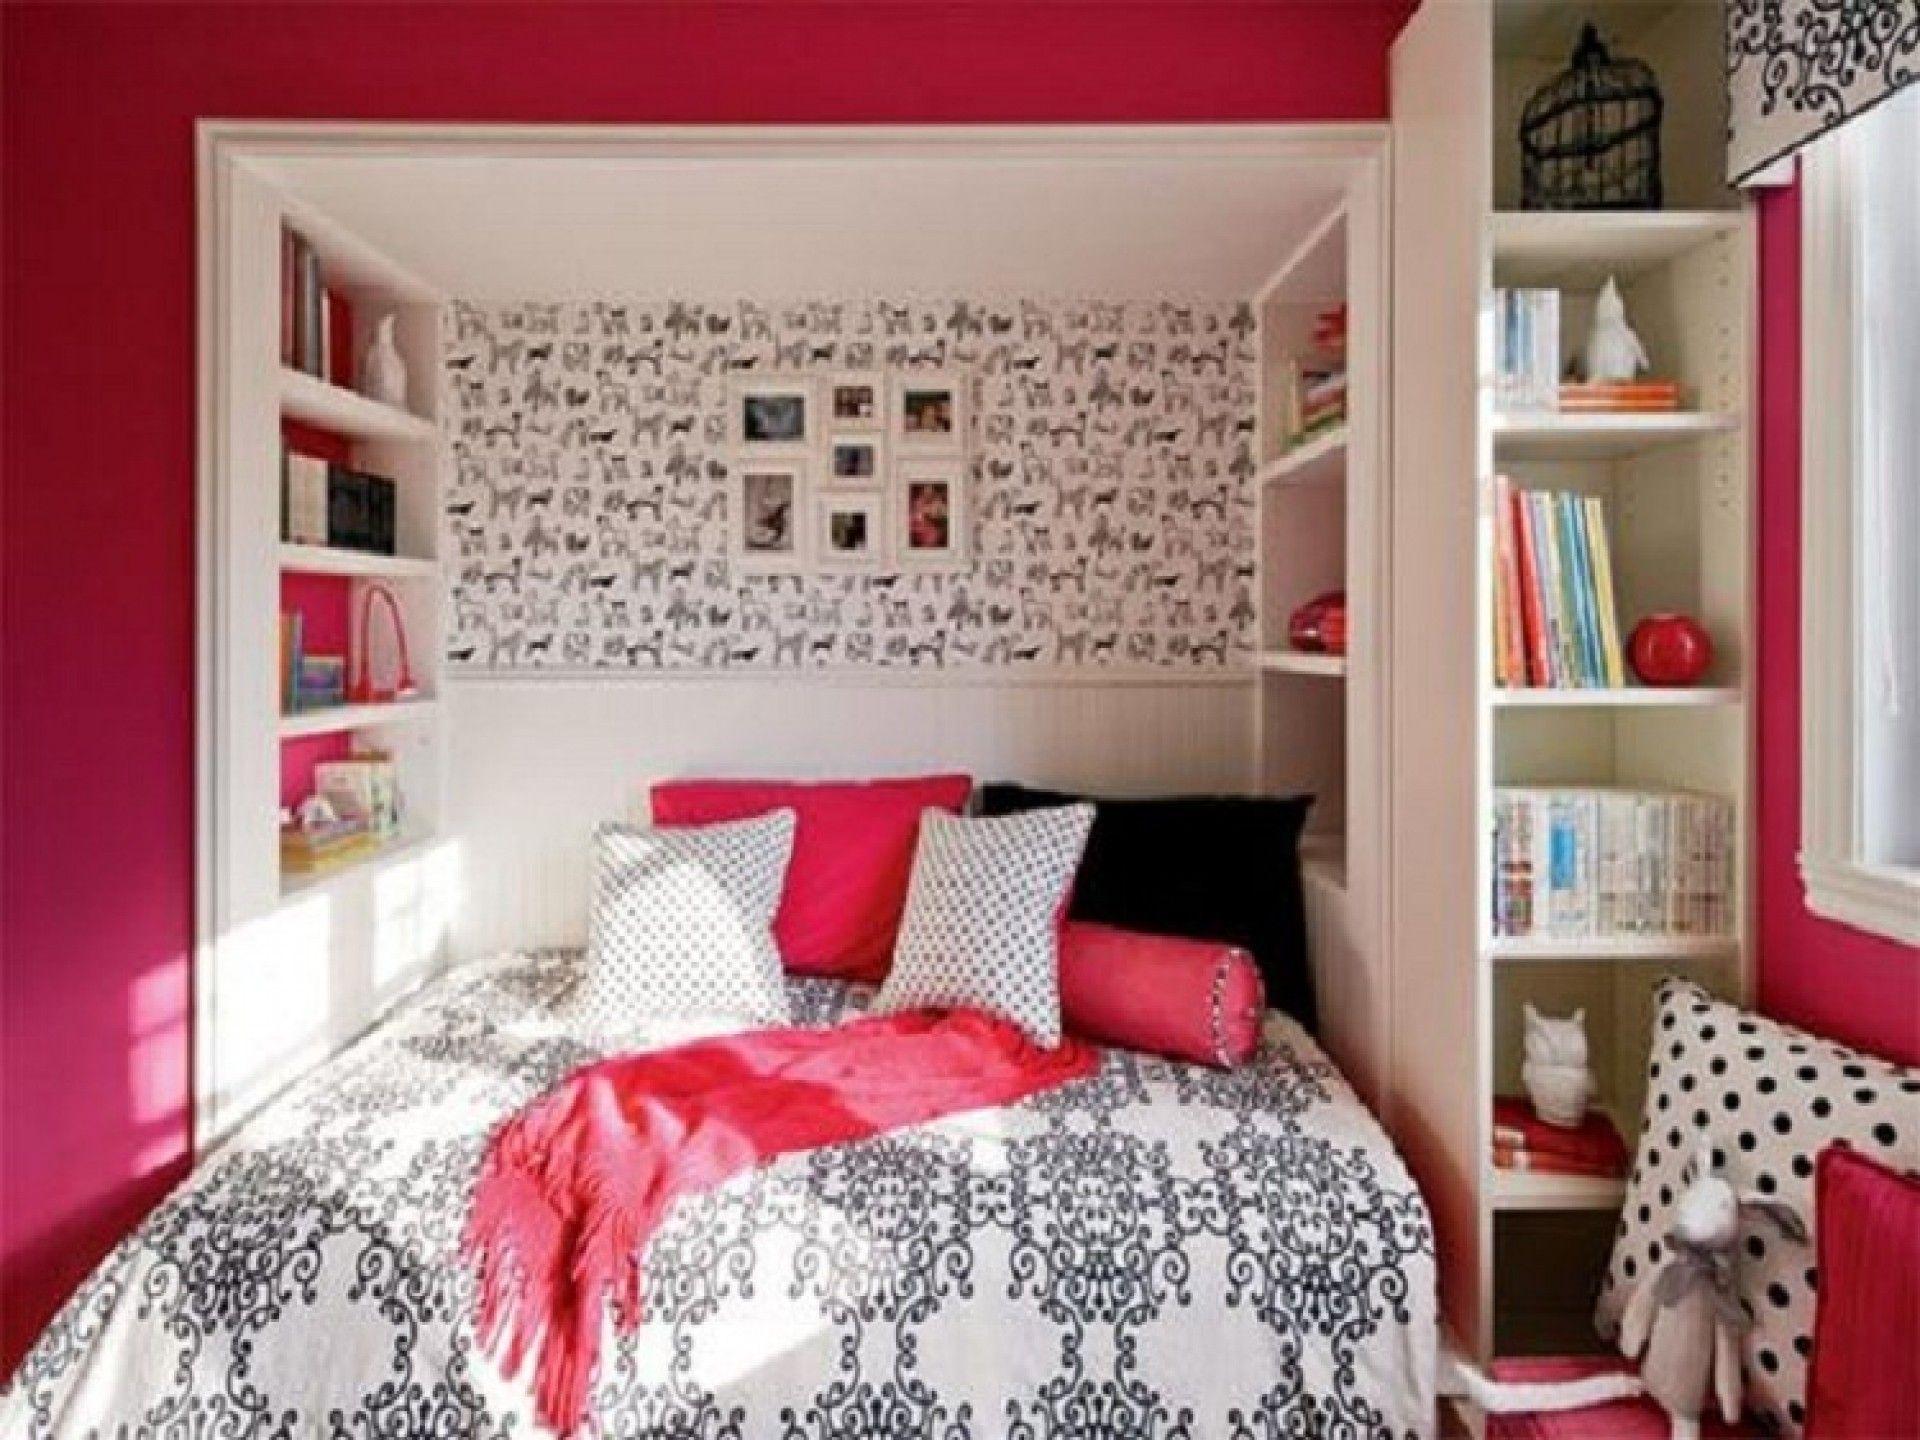 Elegant Fresh Room Design Ideas For Pretentious And Stylish Teenage Girls. Girl  Rooms, Girls Room Decor, Girls Room Ideas For Best Result Of Home Design